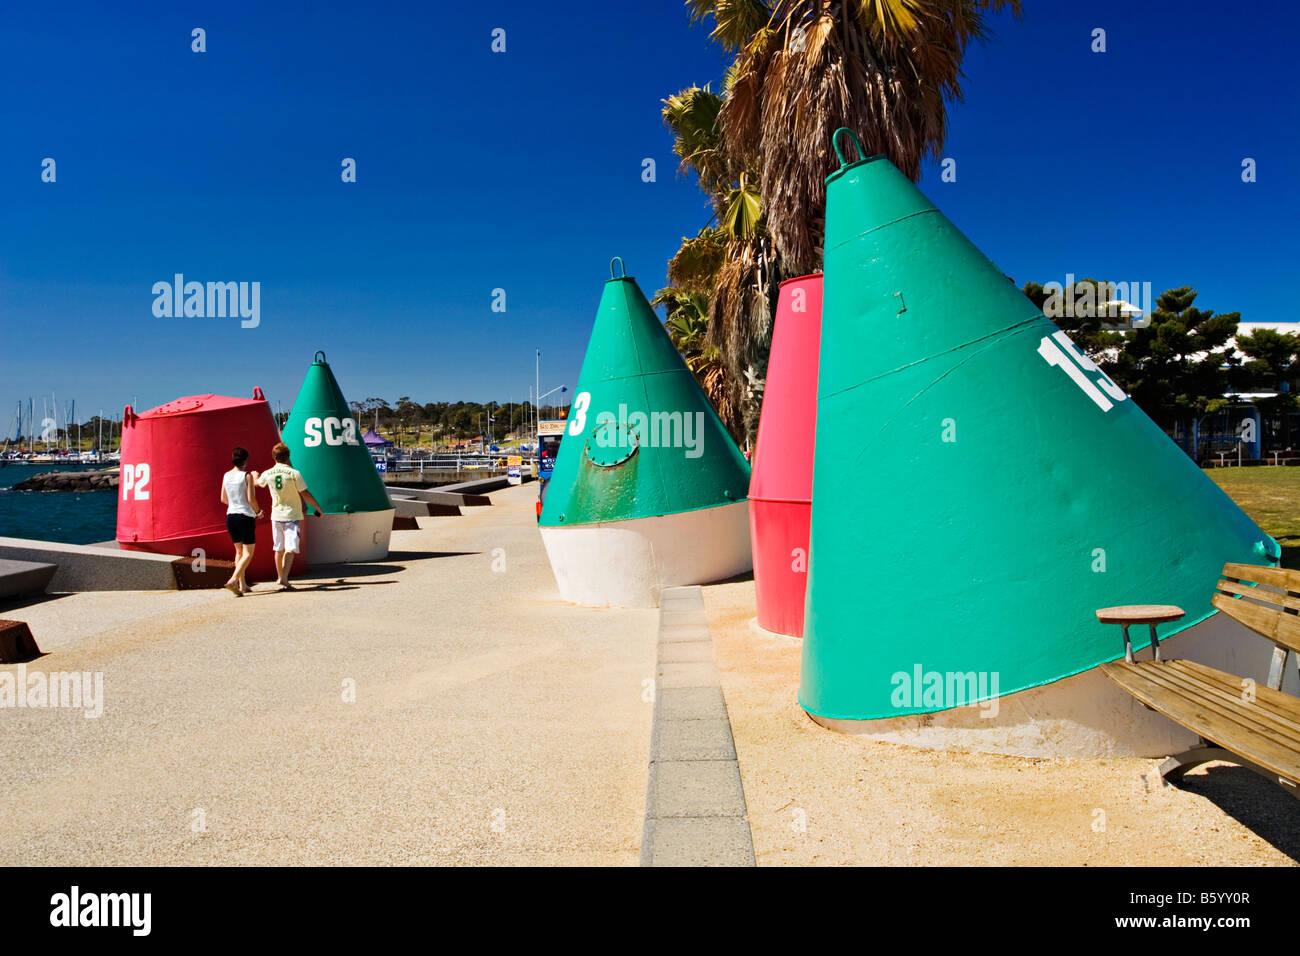 geelong-australia-colourful-painted-buoys-on-the-geelong-waterfront-B5YY0R.jpg